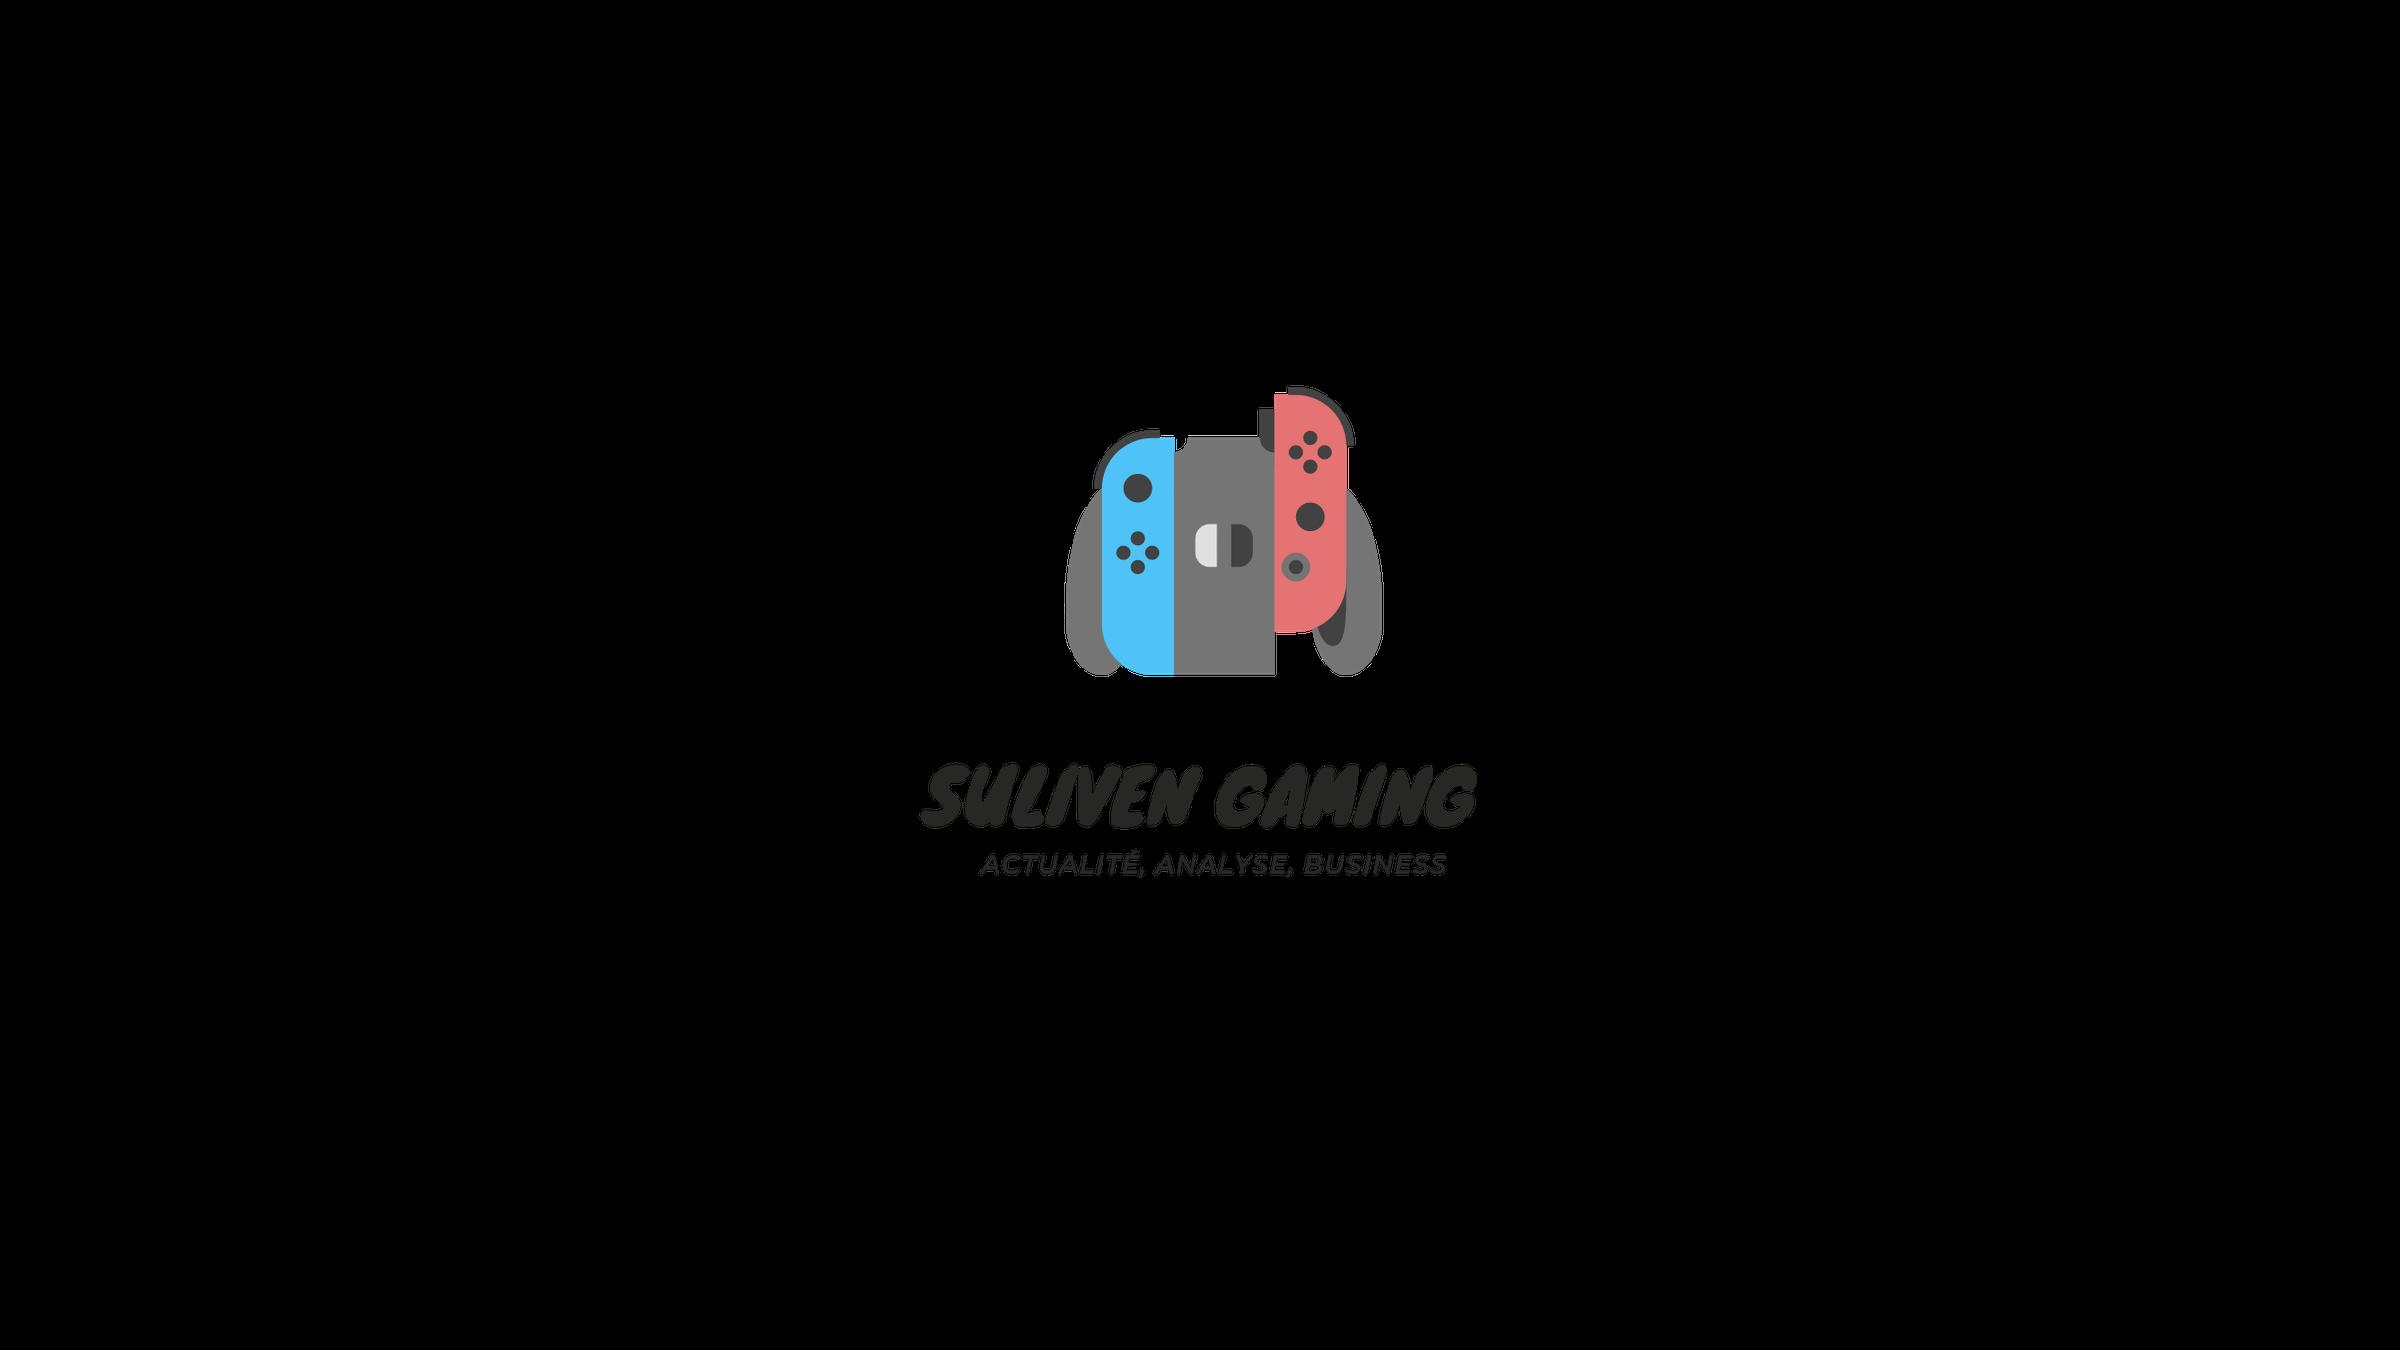 Le Blog Suliven Gaming